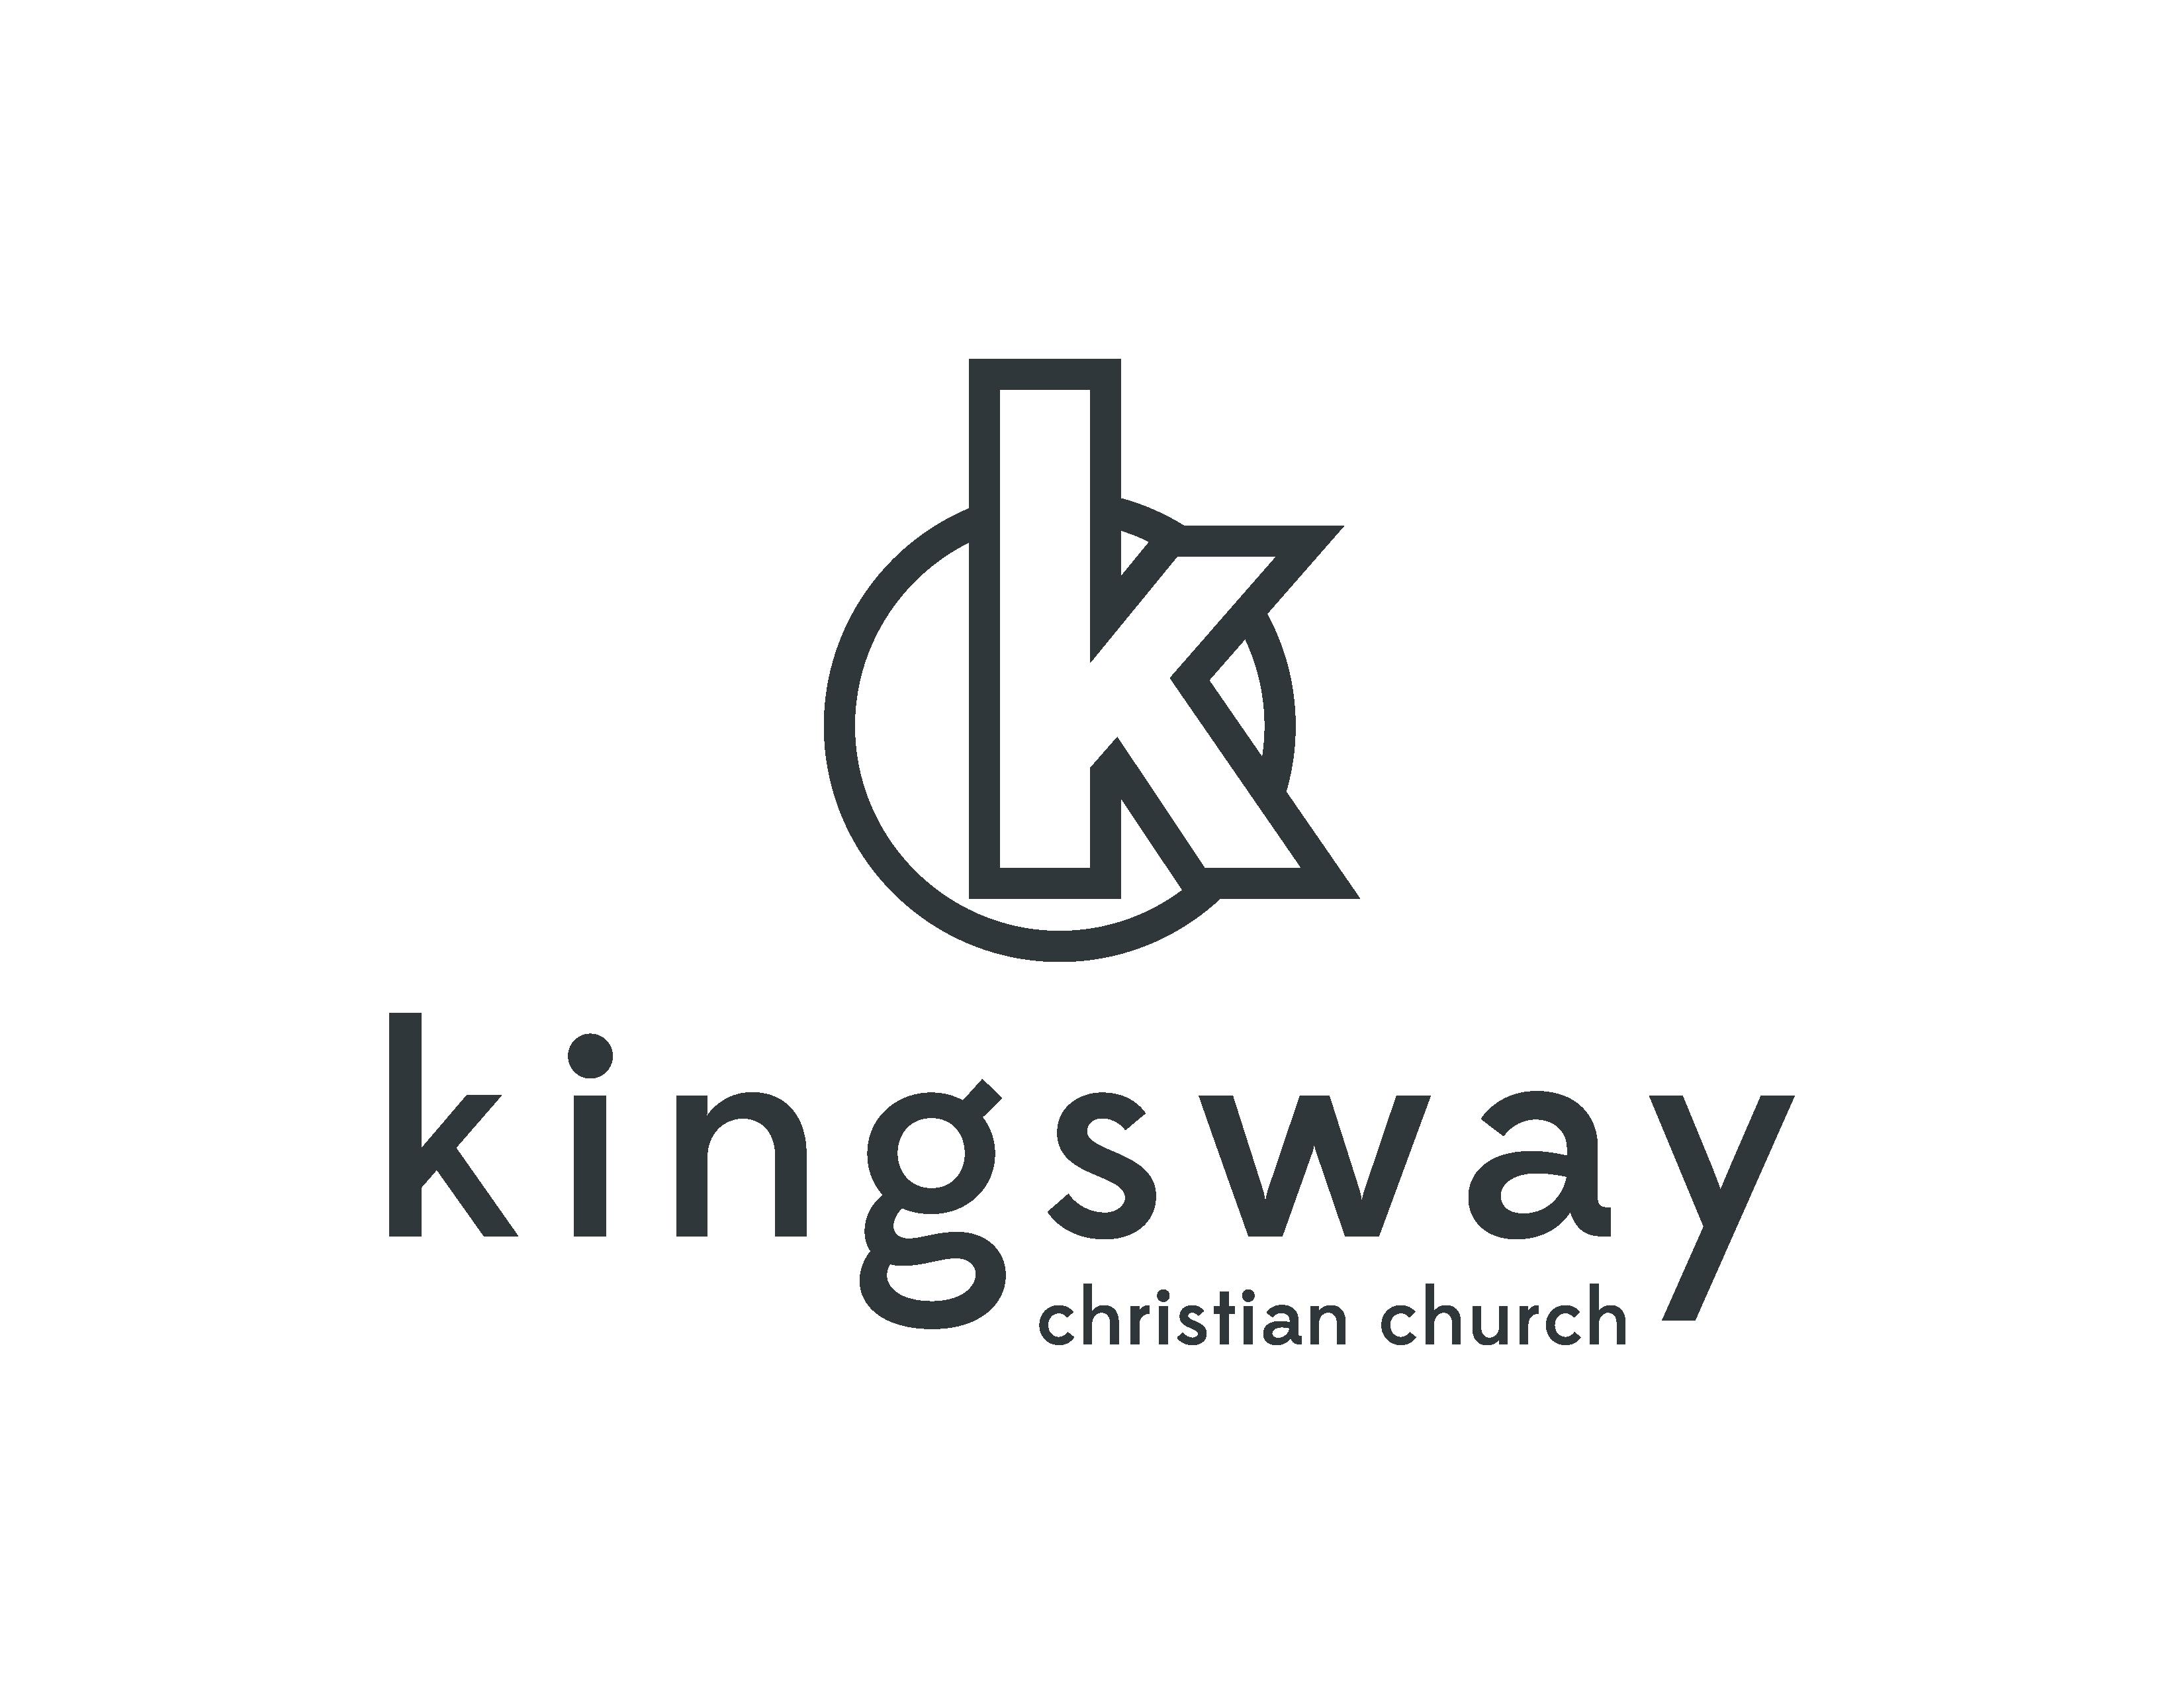 Kingsway Christian Church